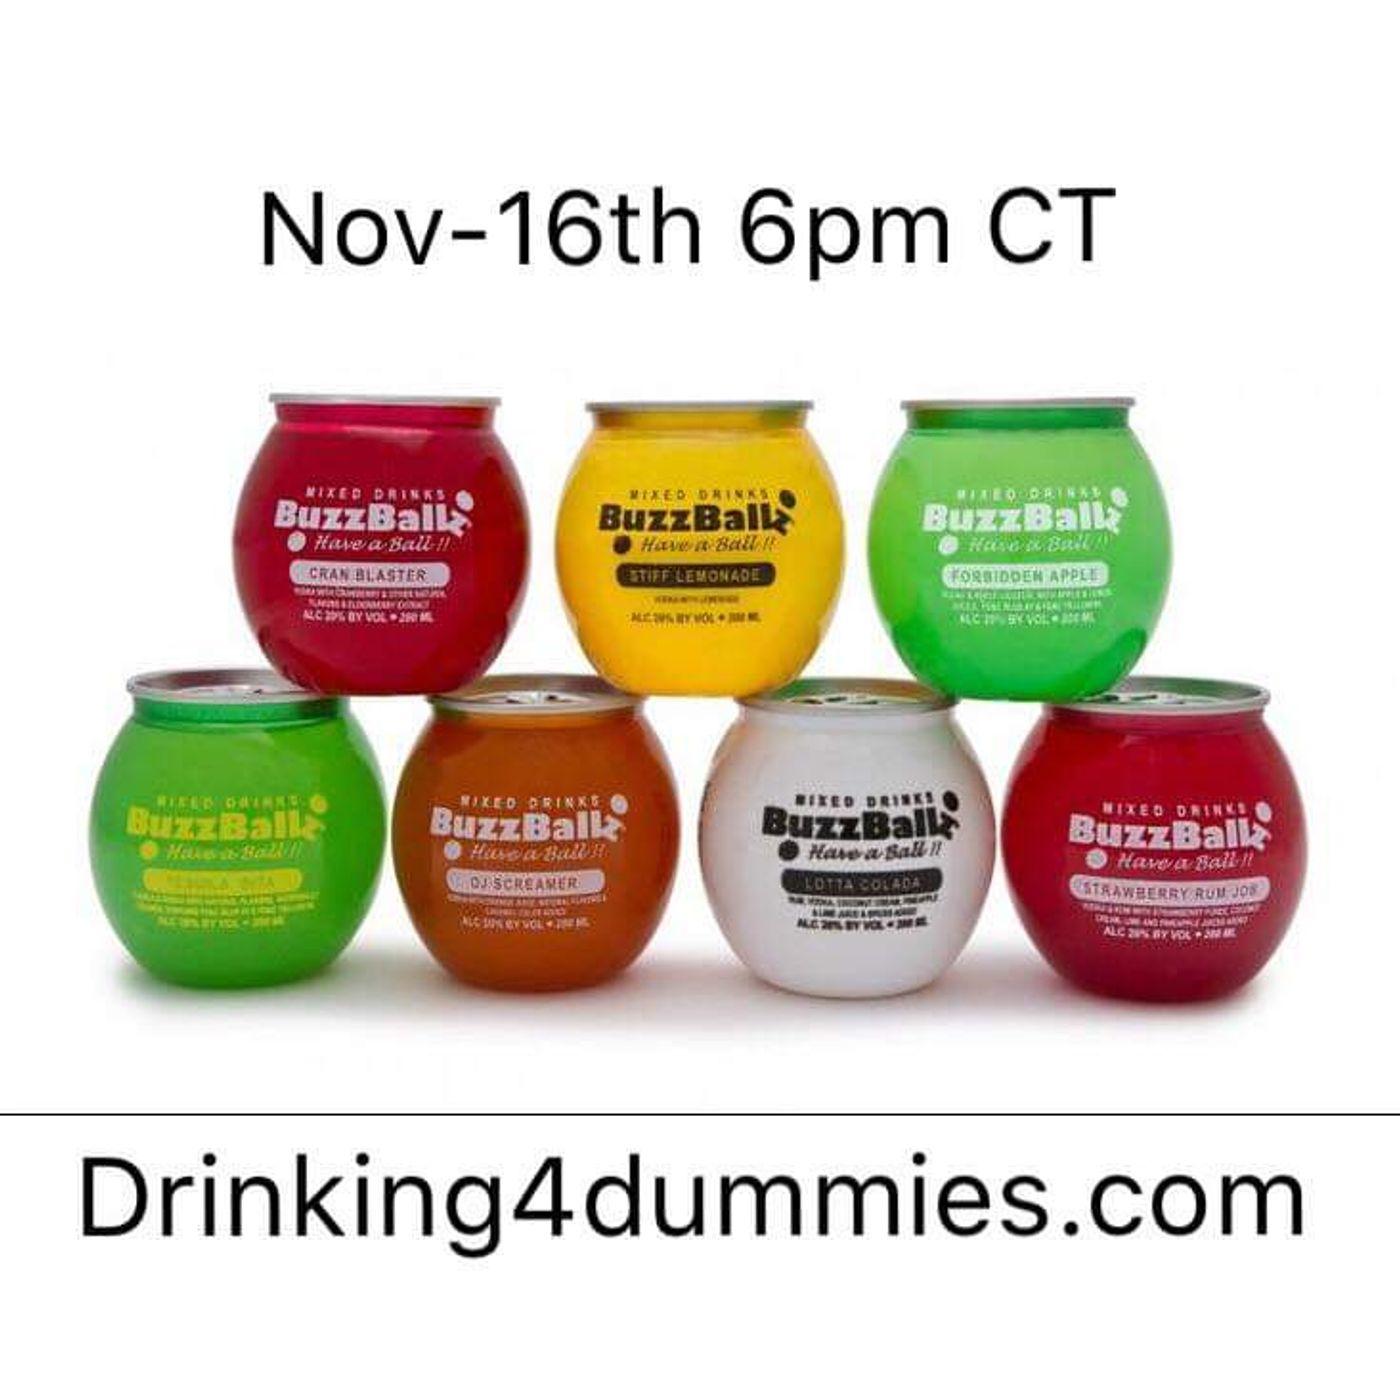 Drinking 4 Dummies Buzz Ball Episode